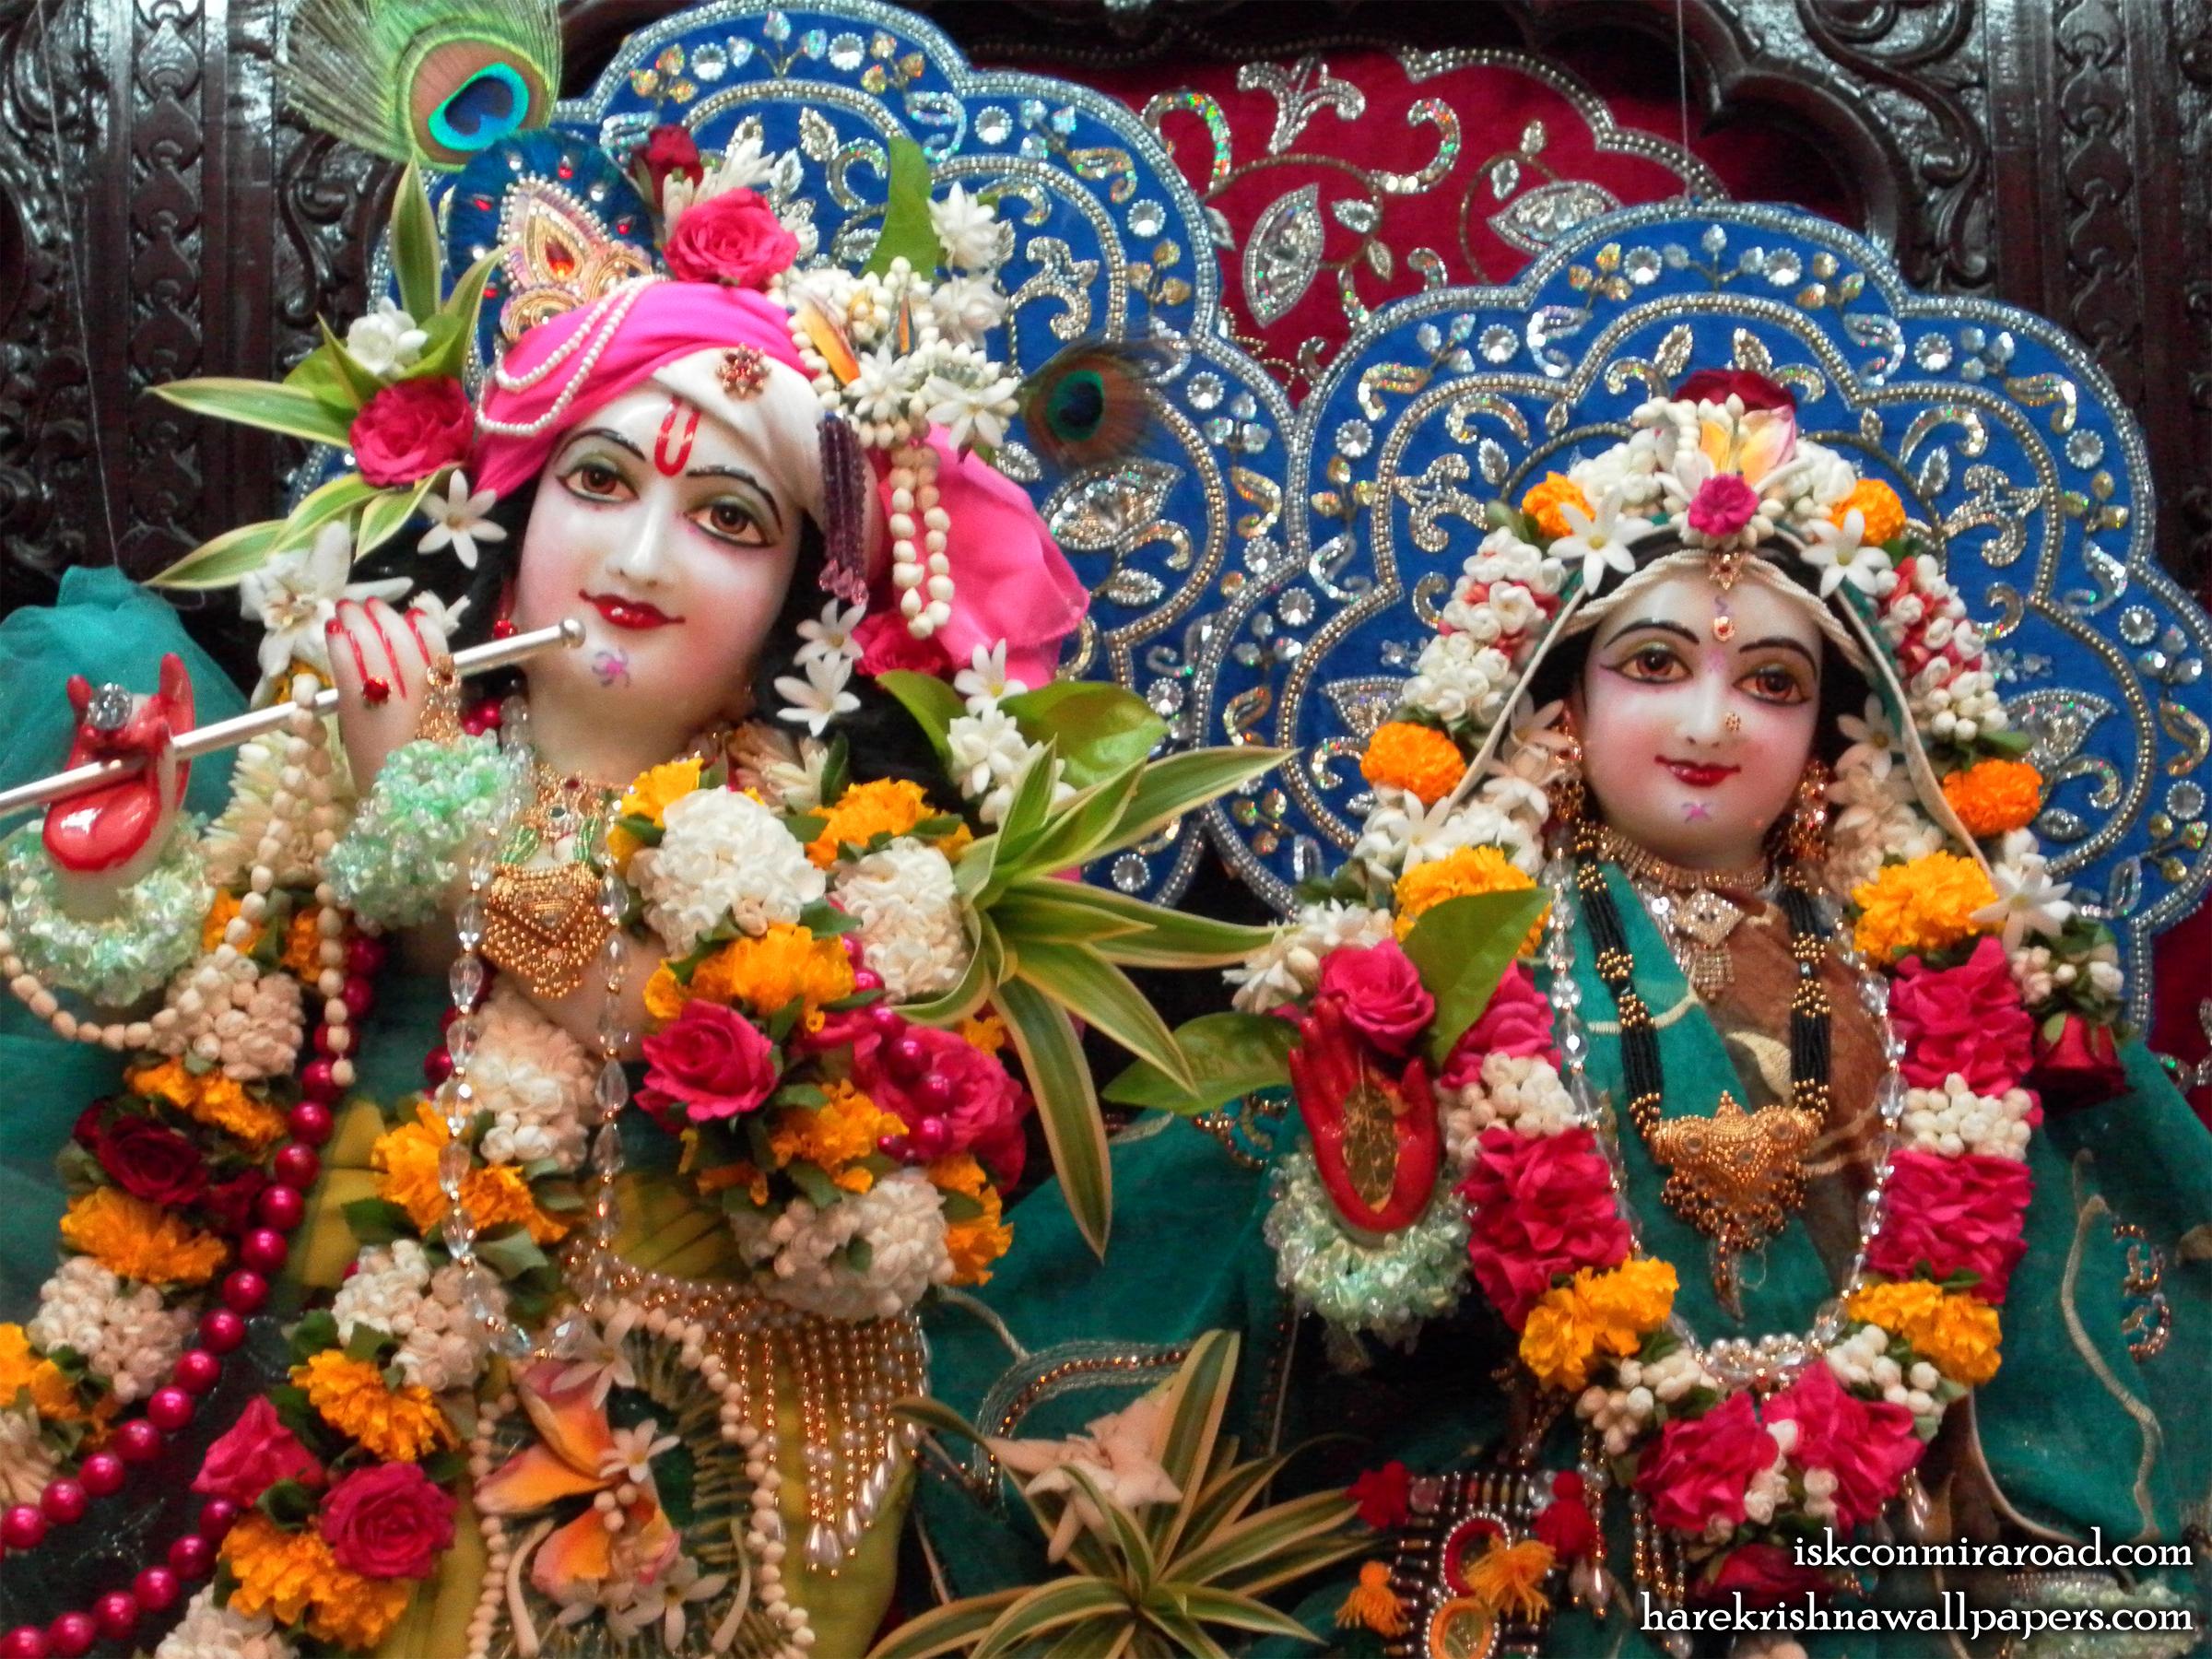 Sri Sri Radha Giridhari Close up Wallpaper (017) Size 2400x1800 Download